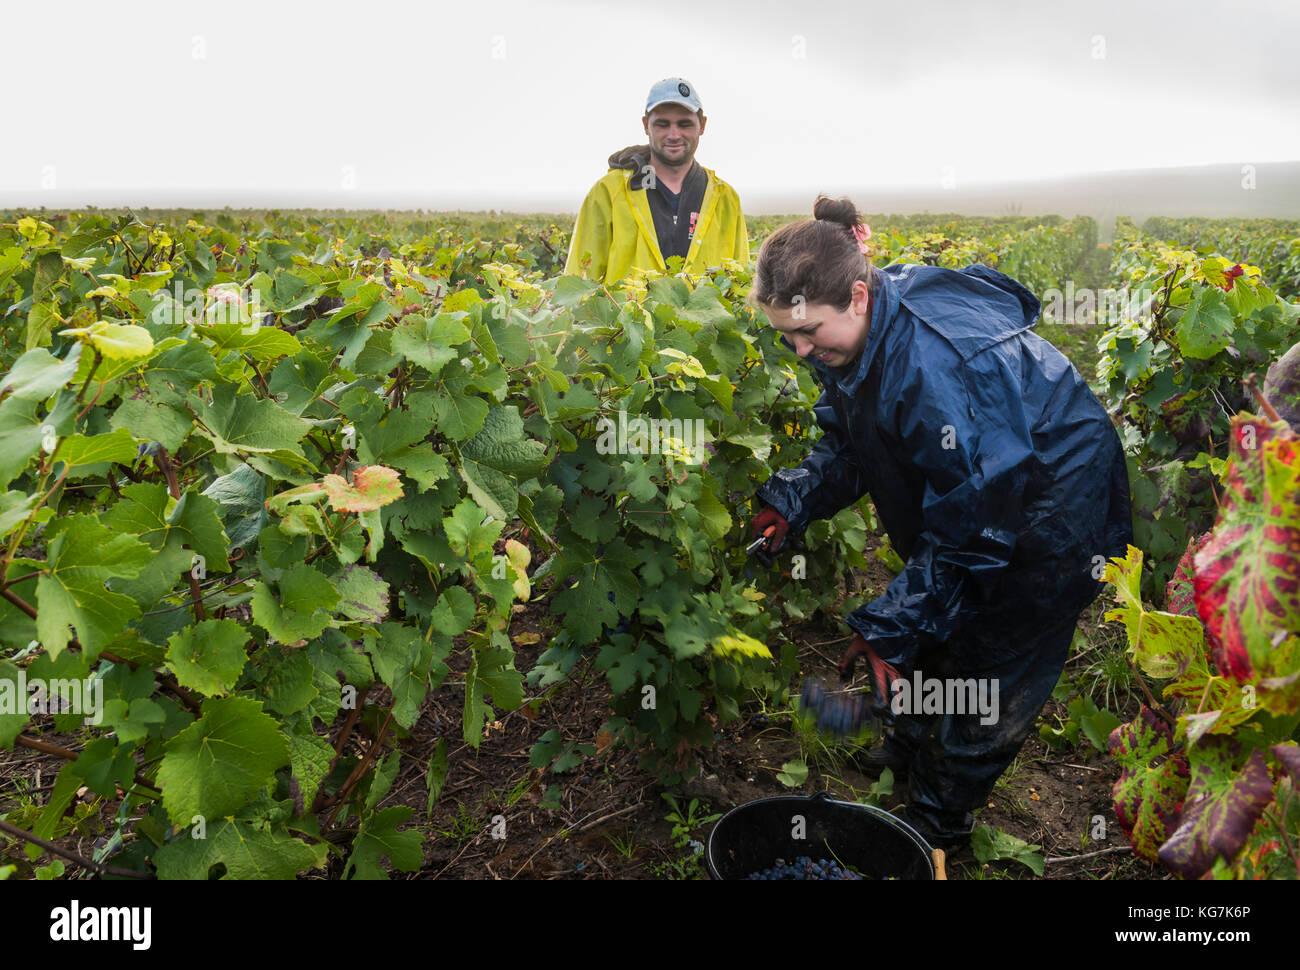 Verzenay stock photos verzenay stock images alamy for Champagne region in france